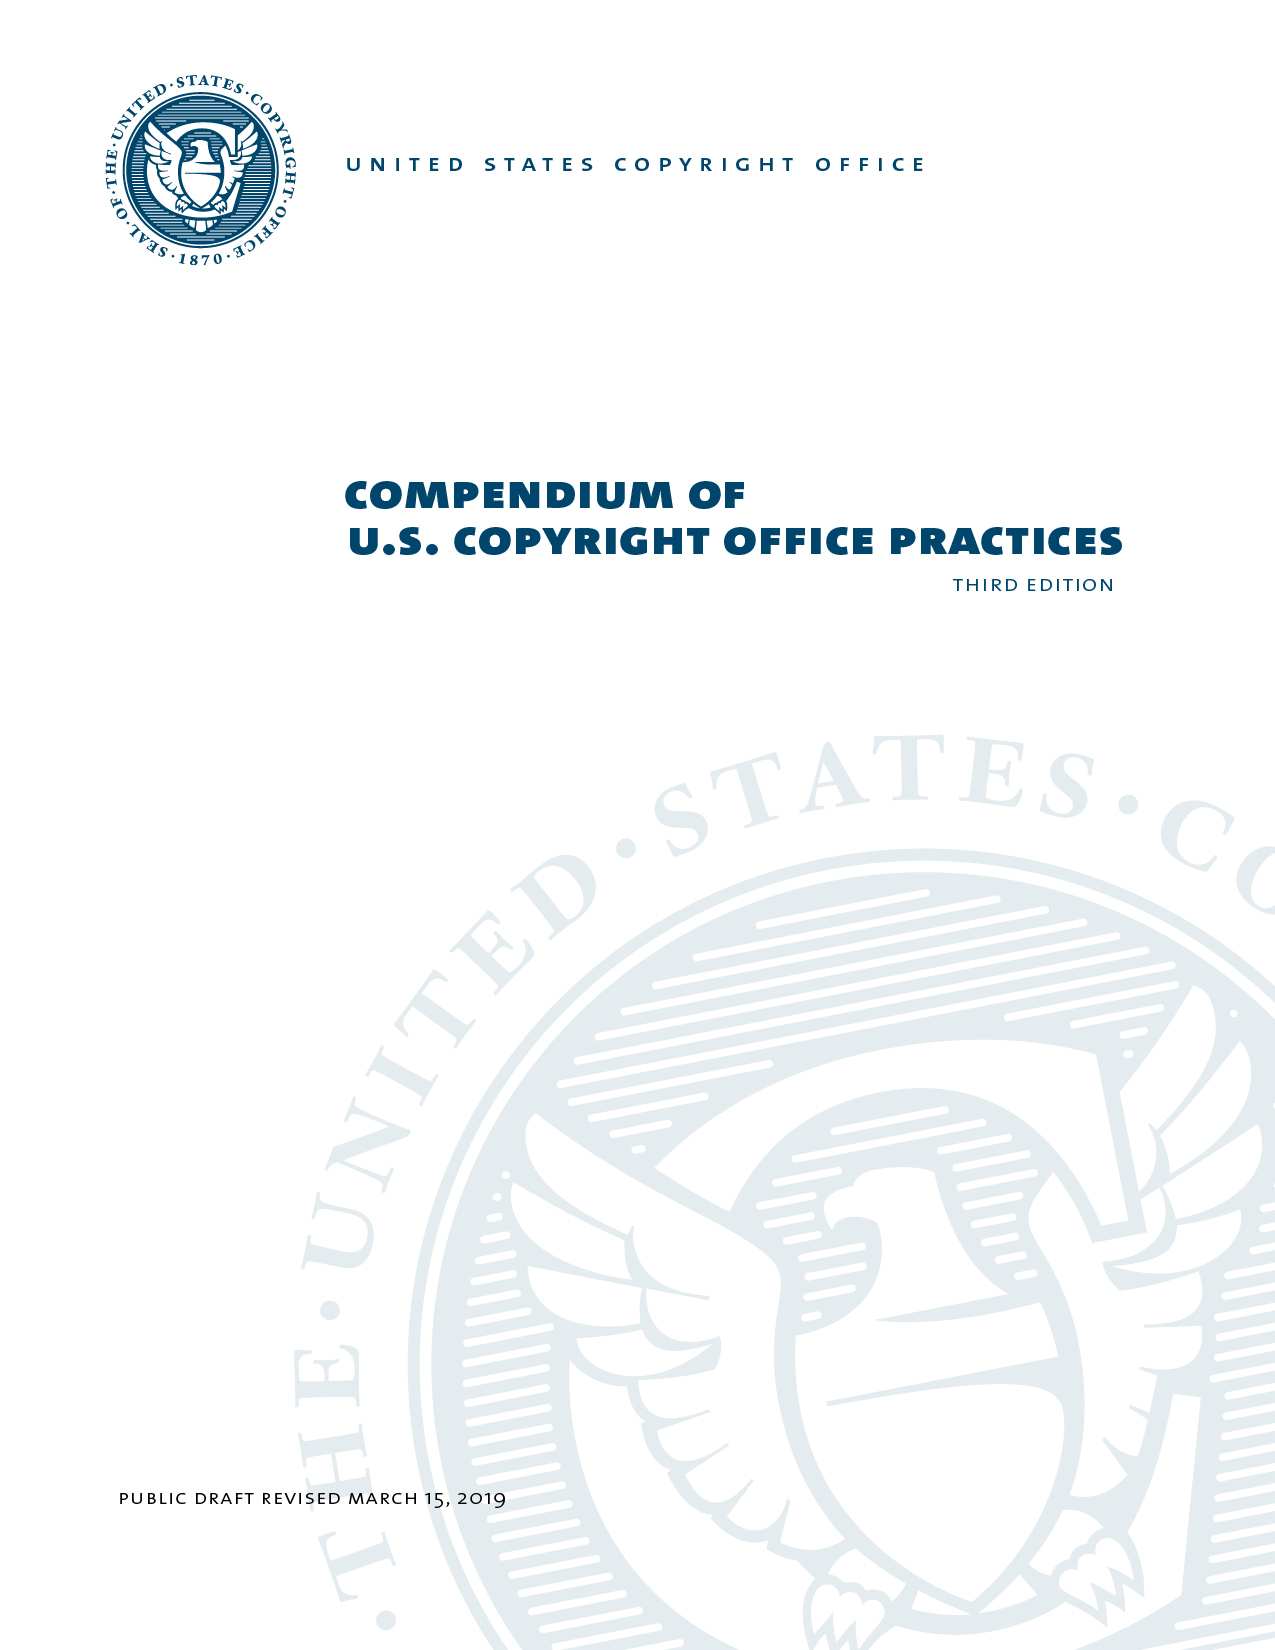 Public Draft for the Compendium of U.S. Copyright Office